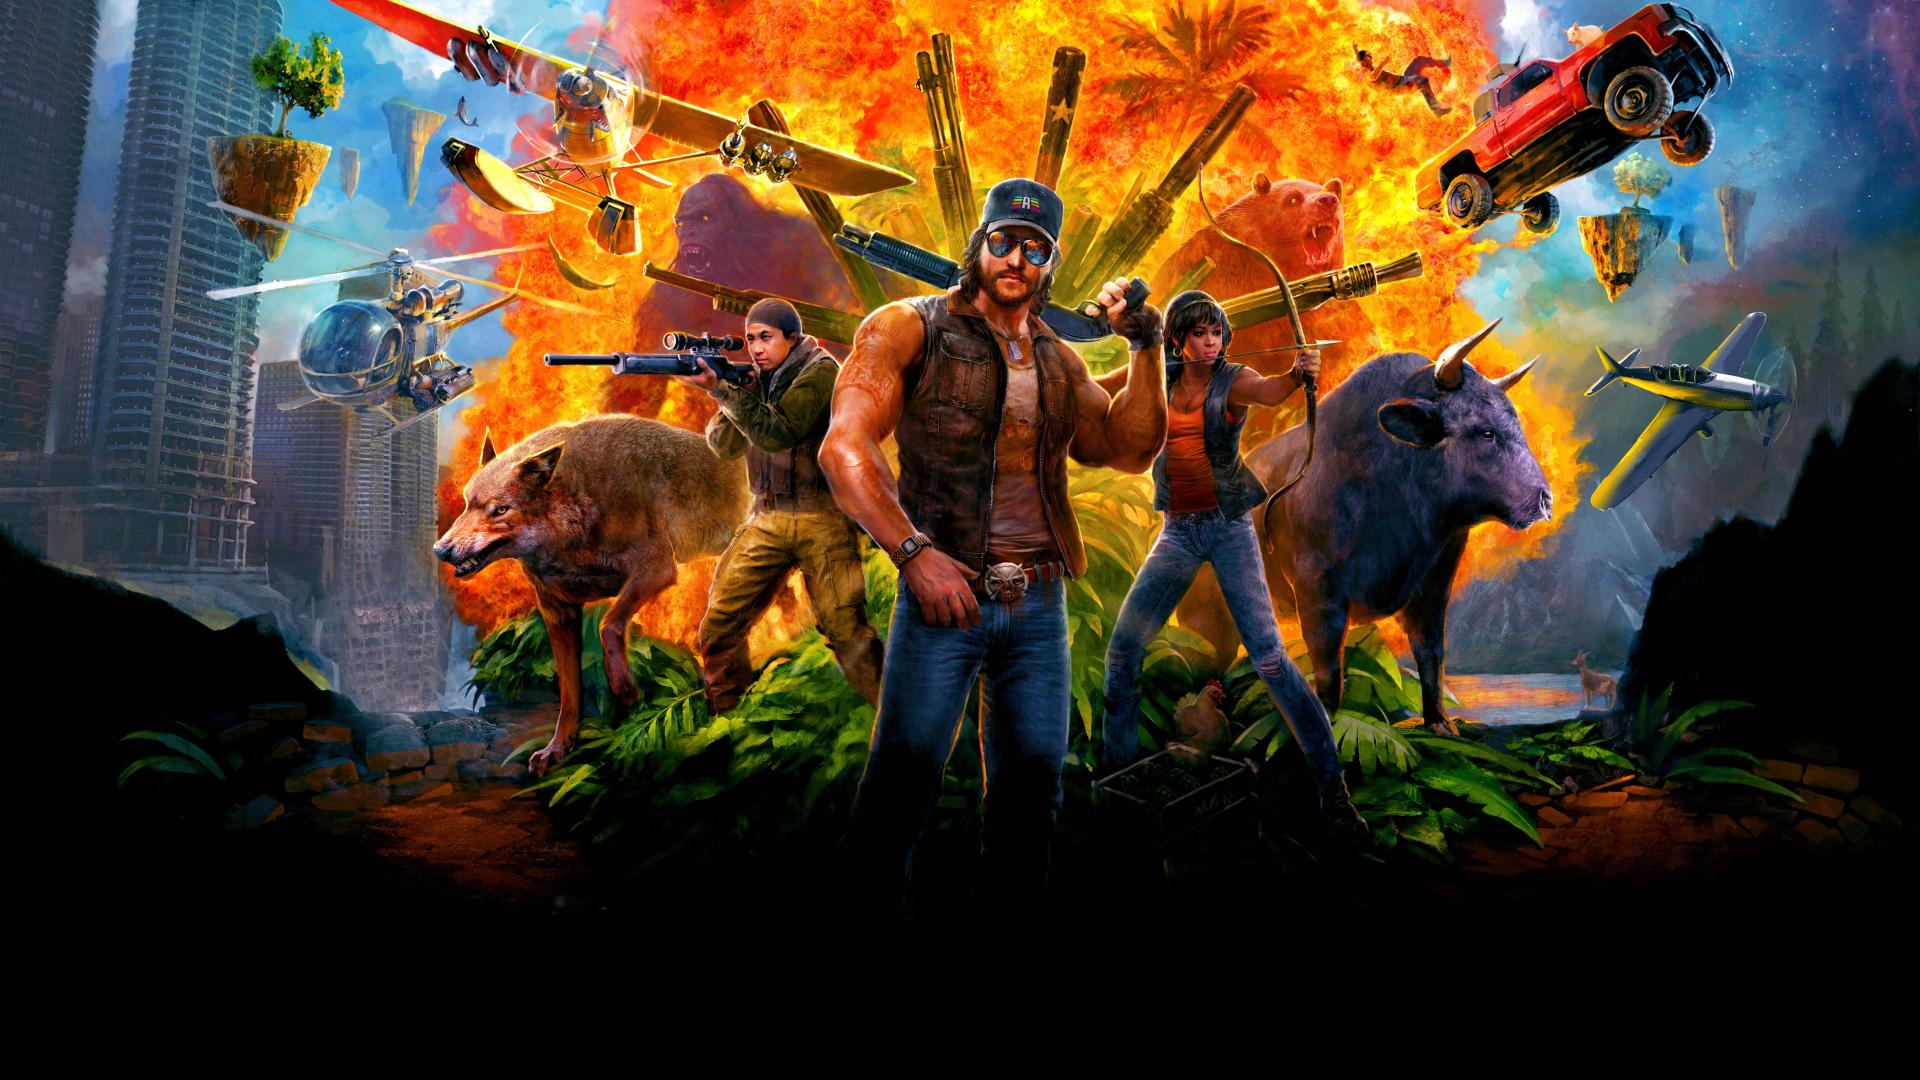 1920x1080 Far Cry 5 Game 1080p Laptop Full Hd Wallpaper Hd Games